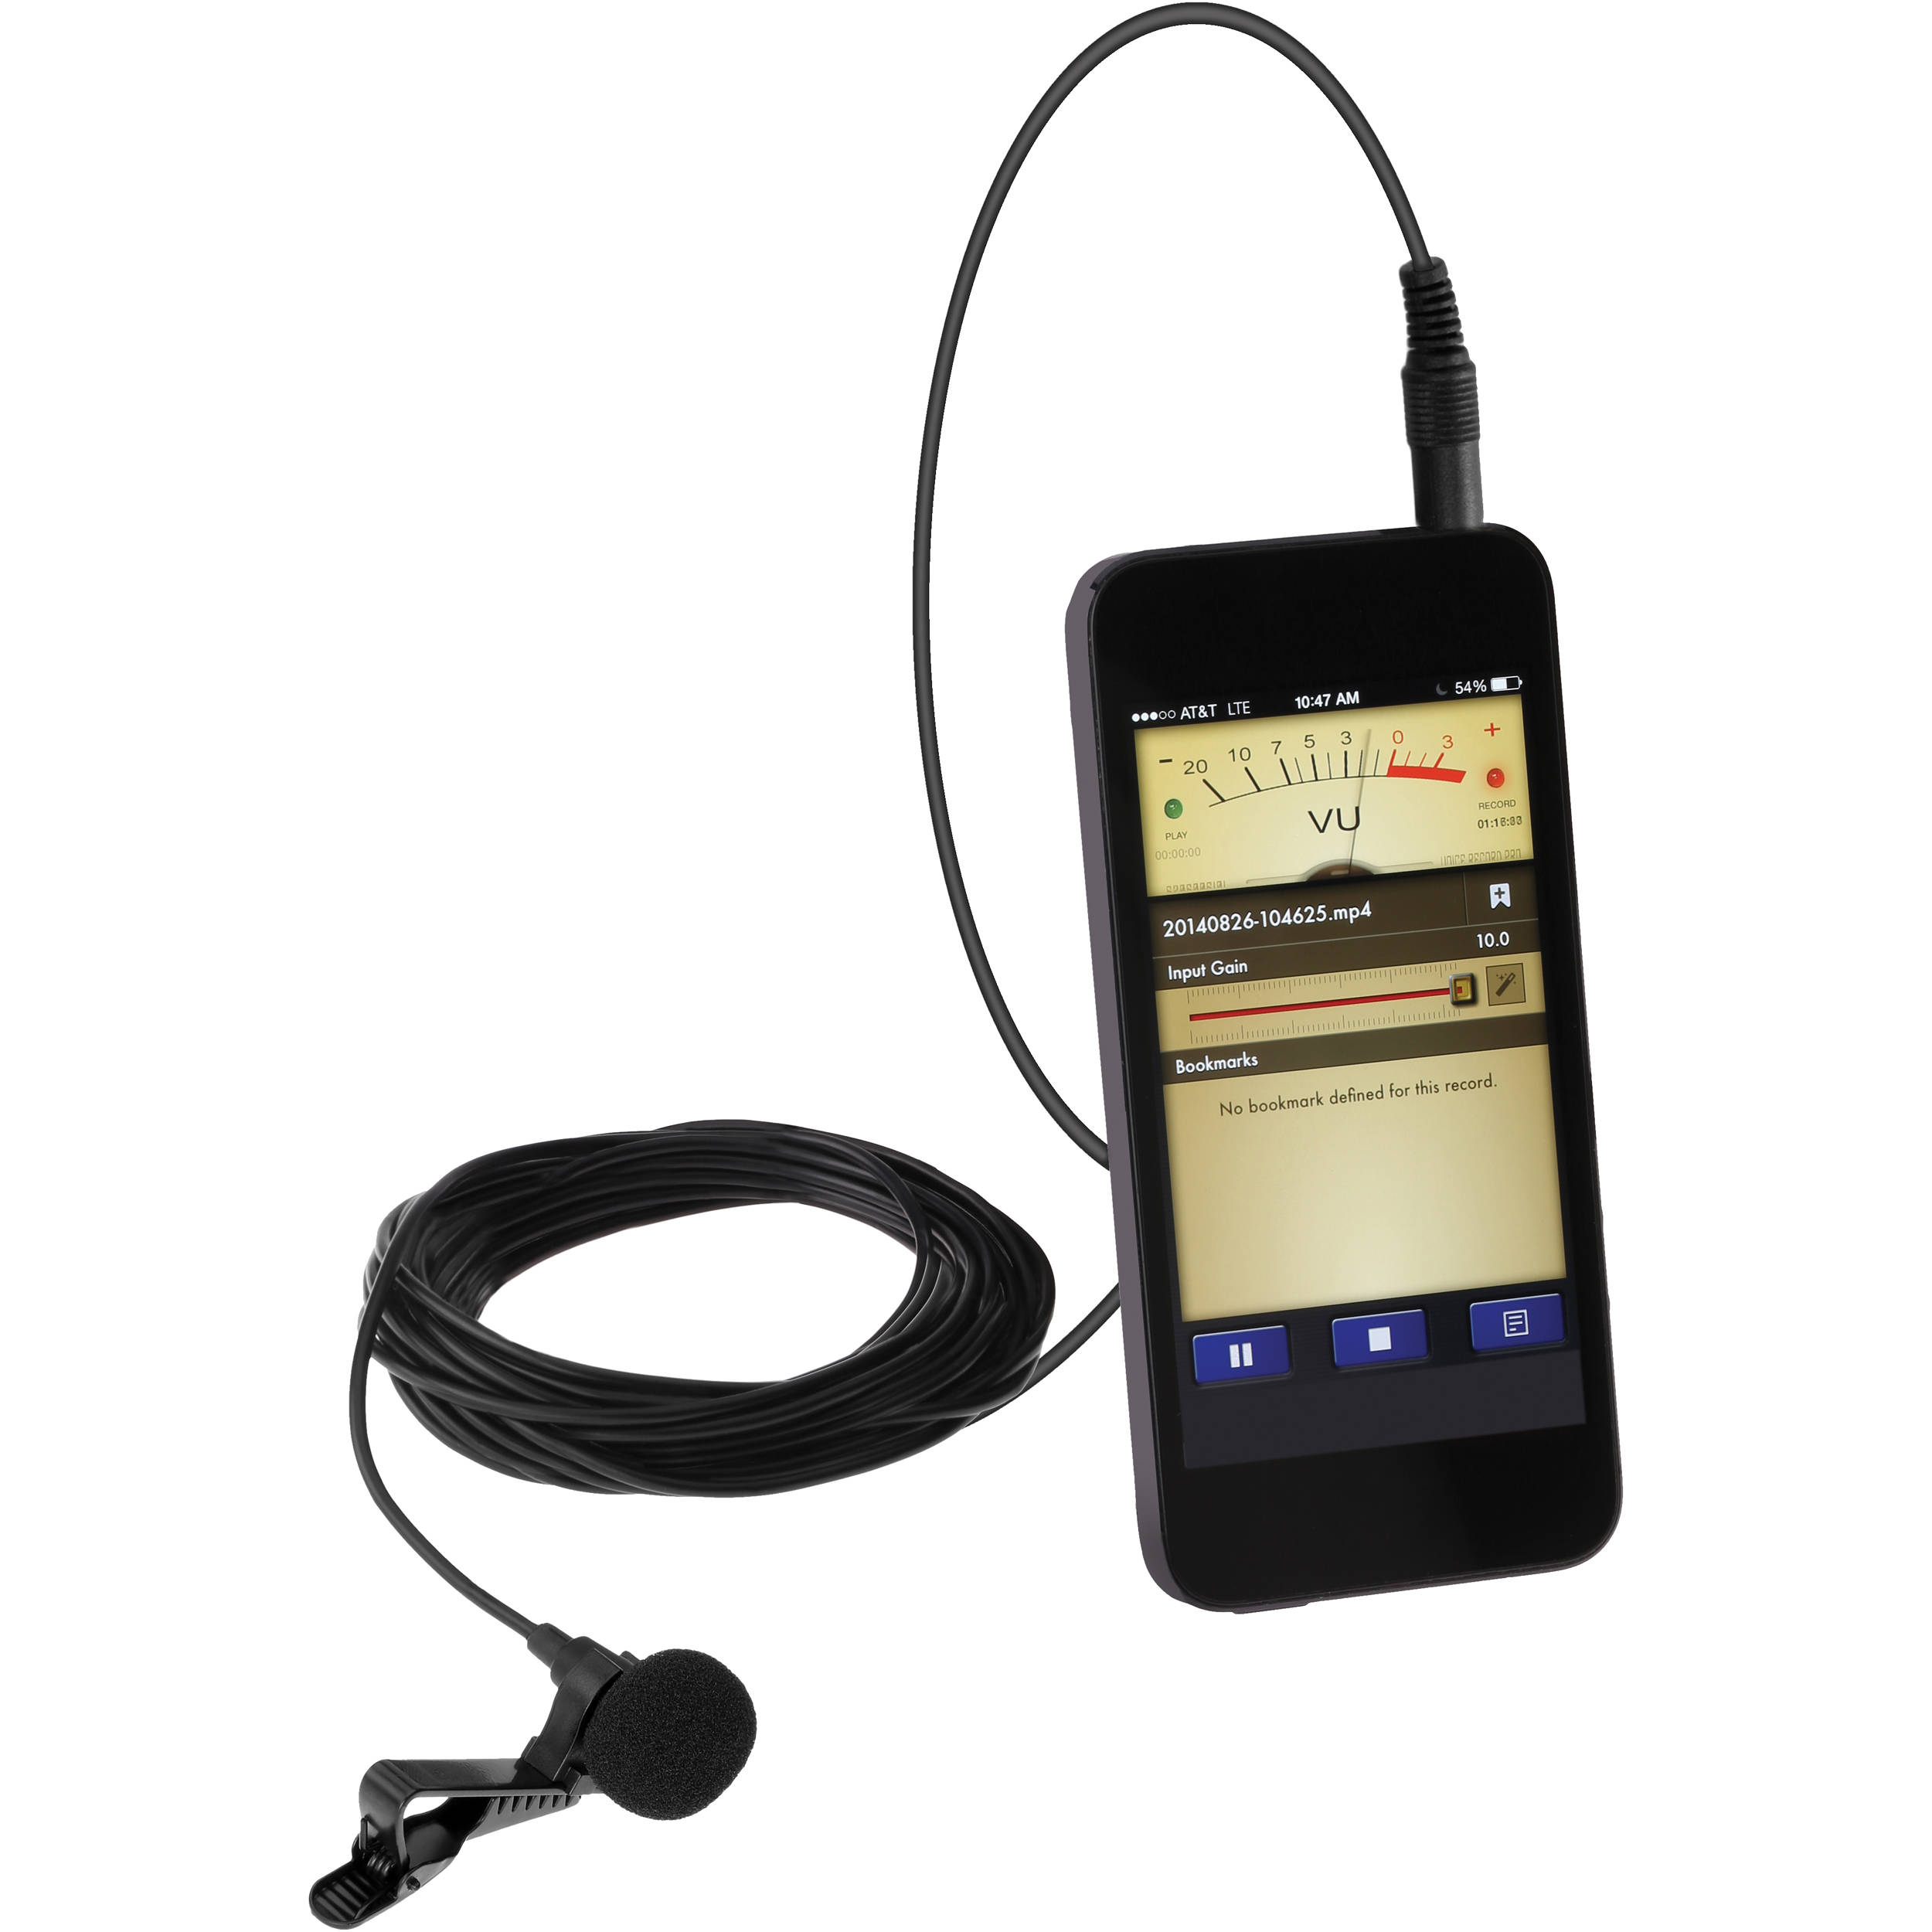 iphone mic. ipod, ipad, or iphone not included iphone mic